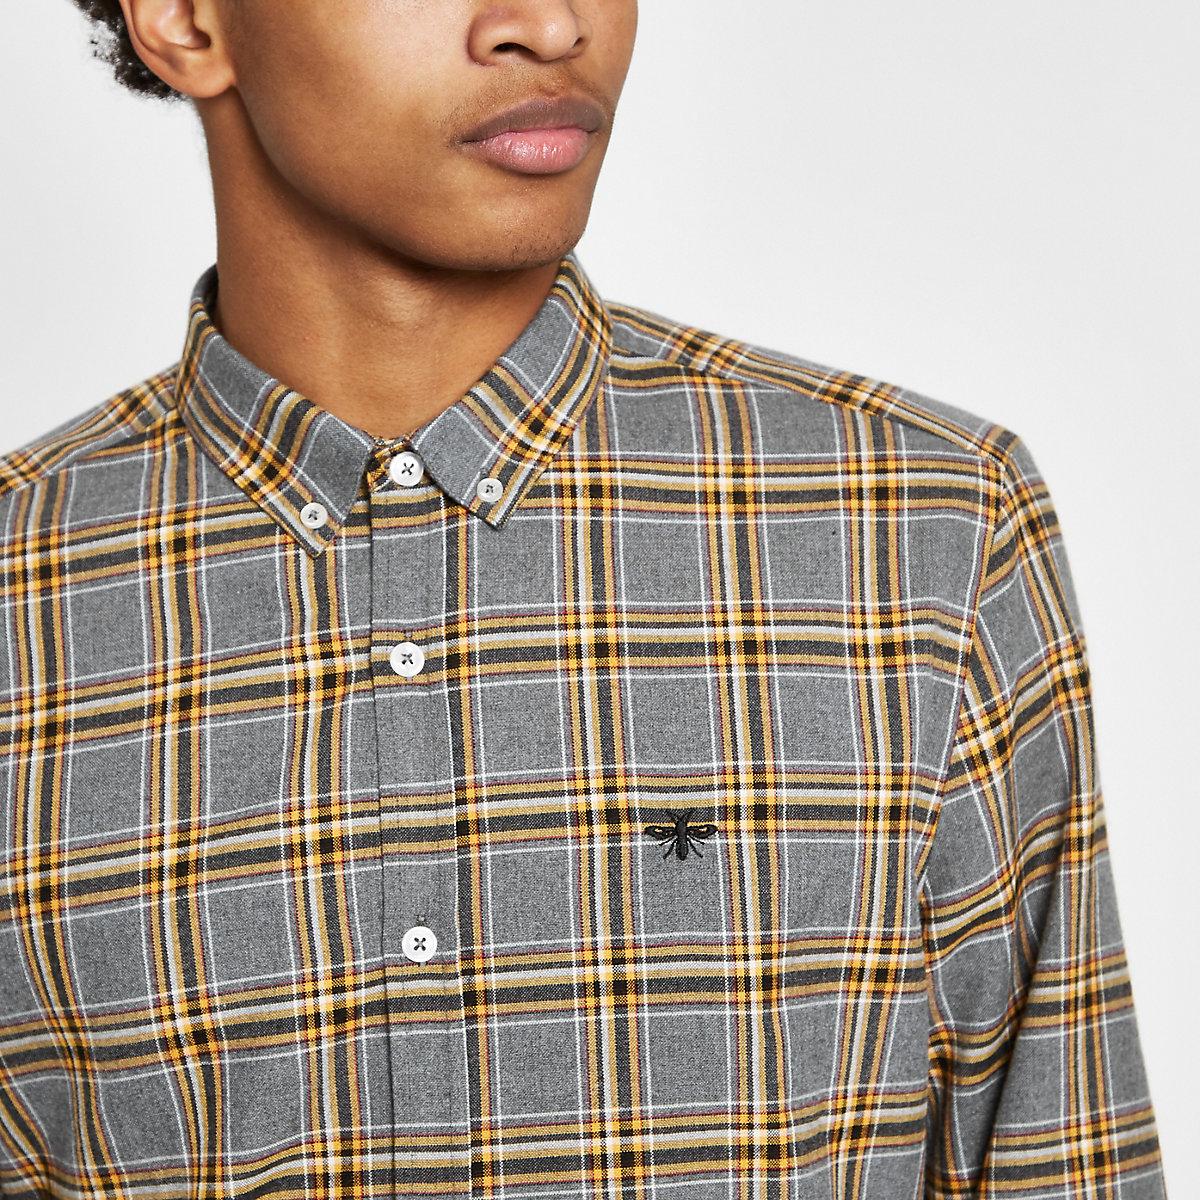 Grey and yellow check long sleeve shirt